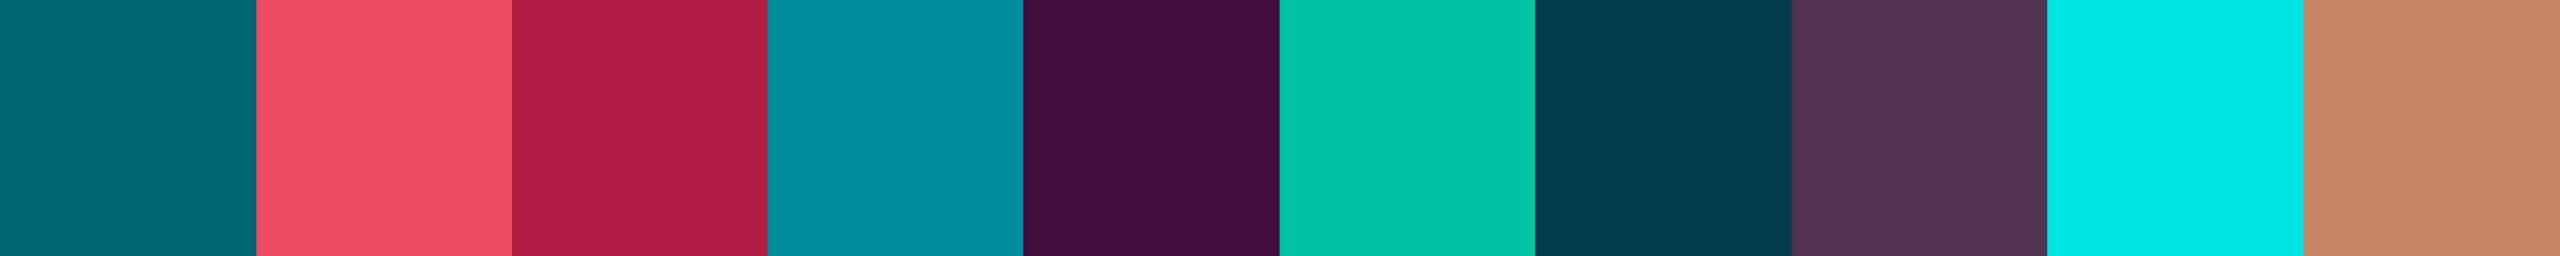 684 Jorapona Color Palette